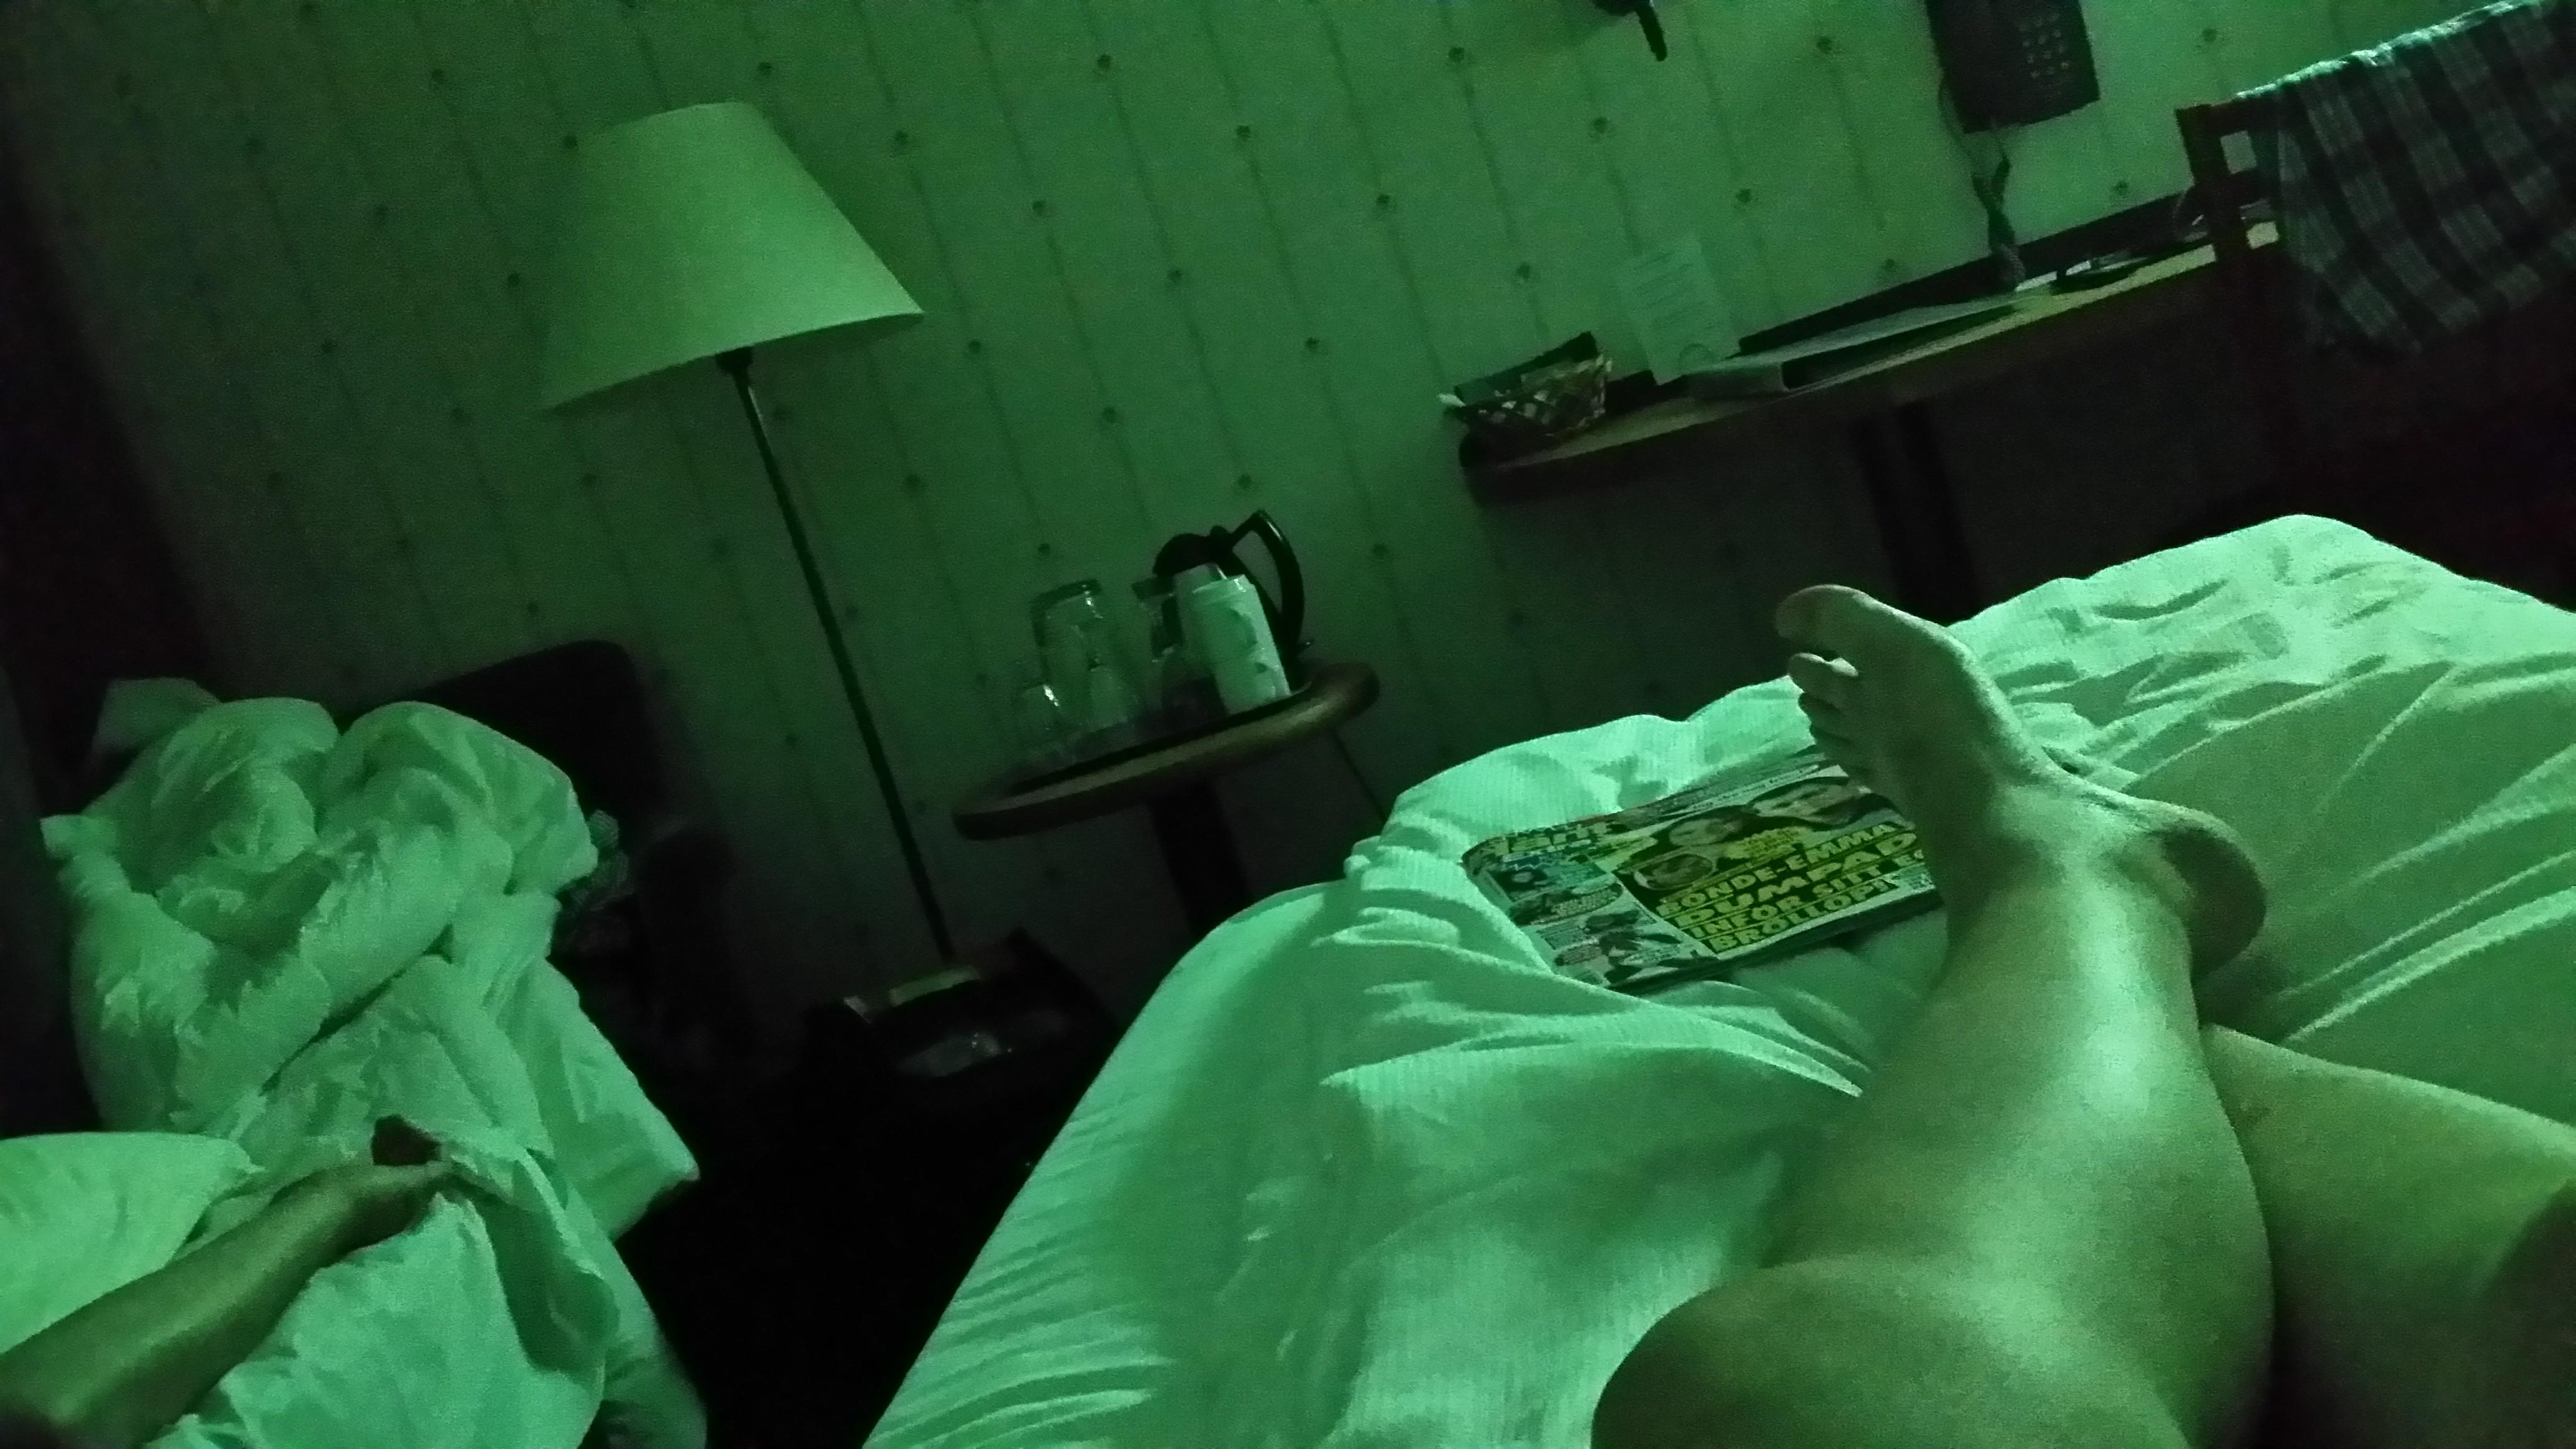 Miljoner hotellrum kan oppnas med superkortet